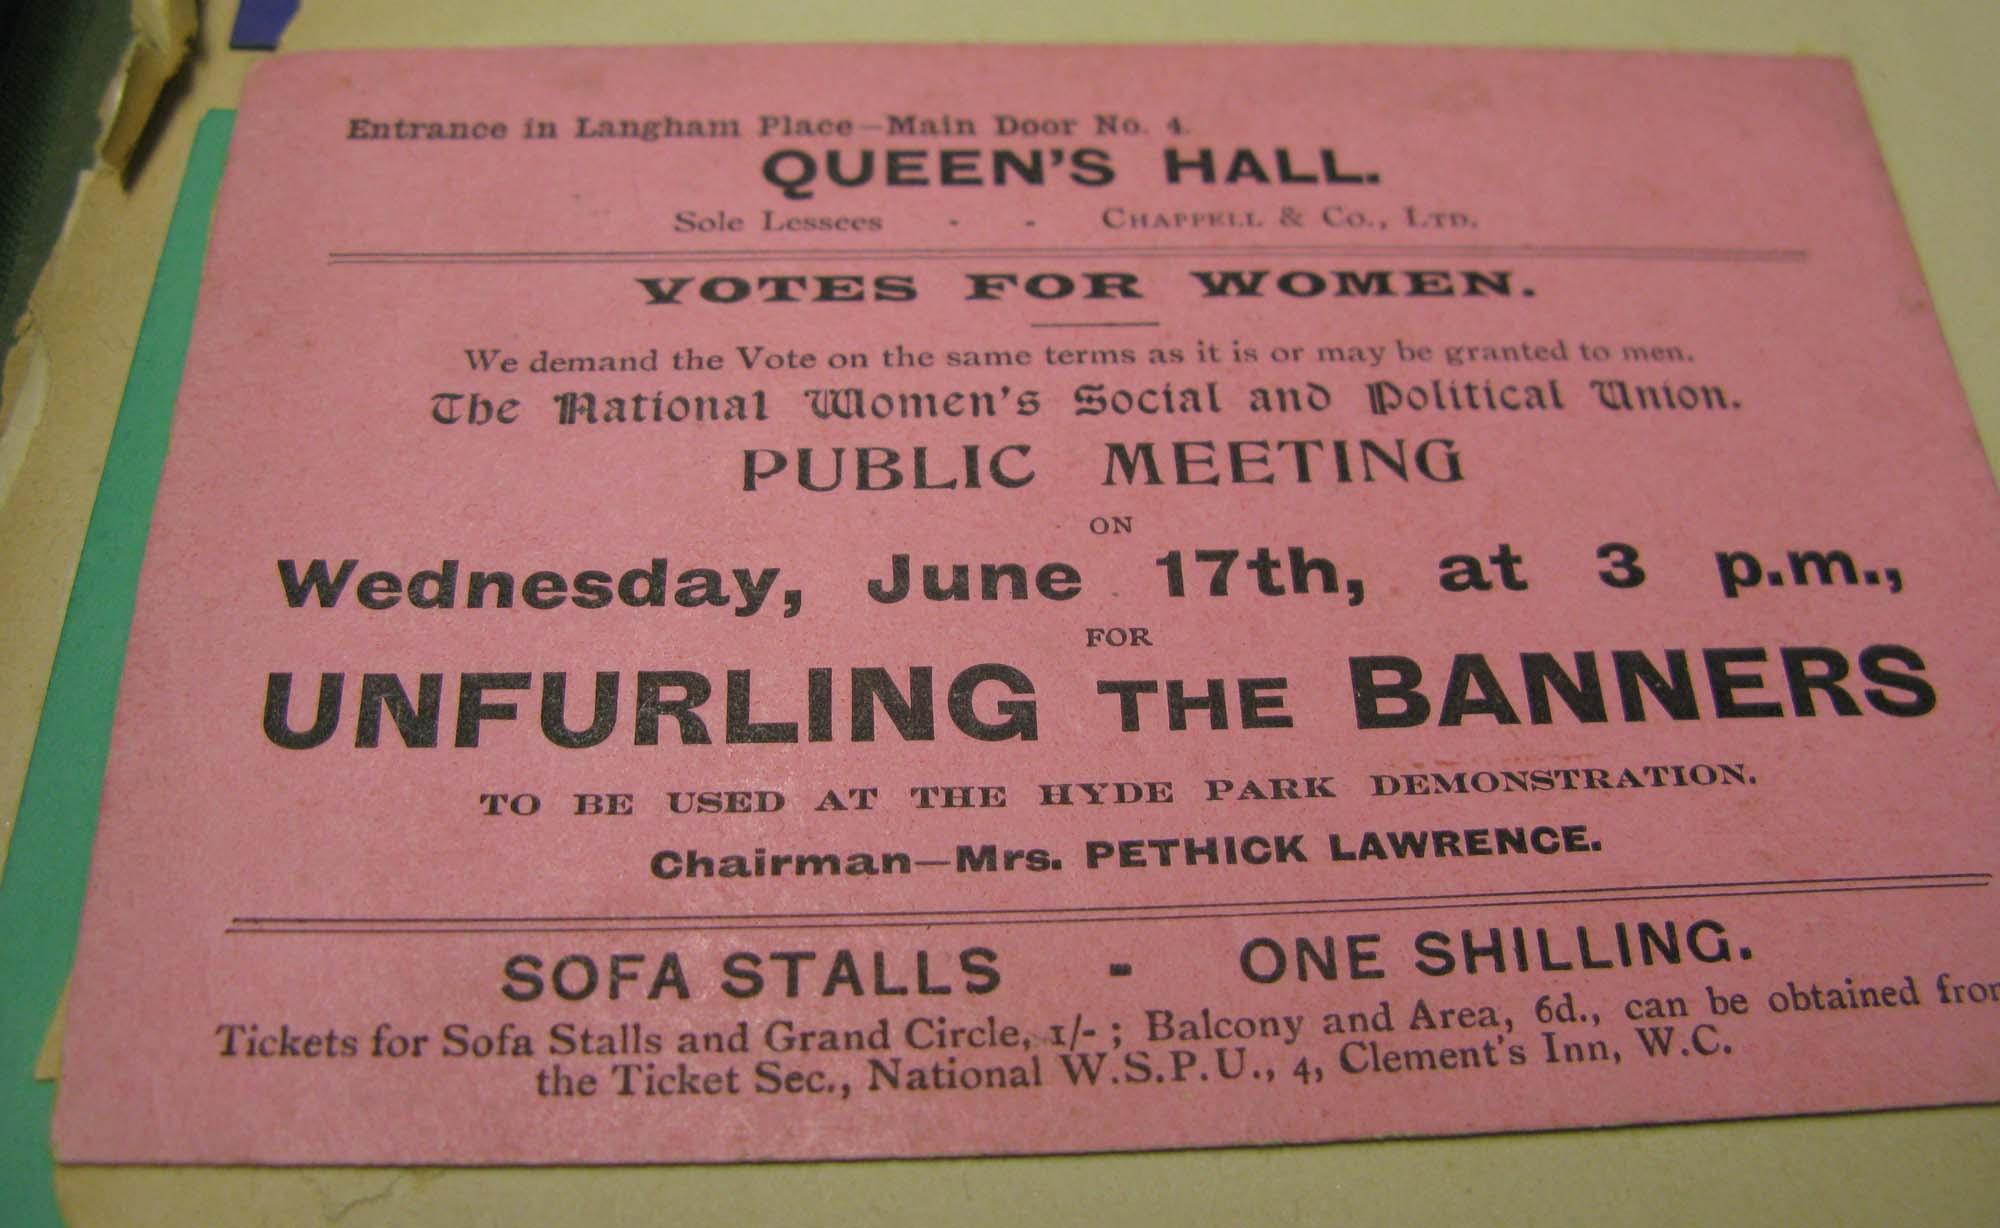 A pink suffragette meeting ticket stub